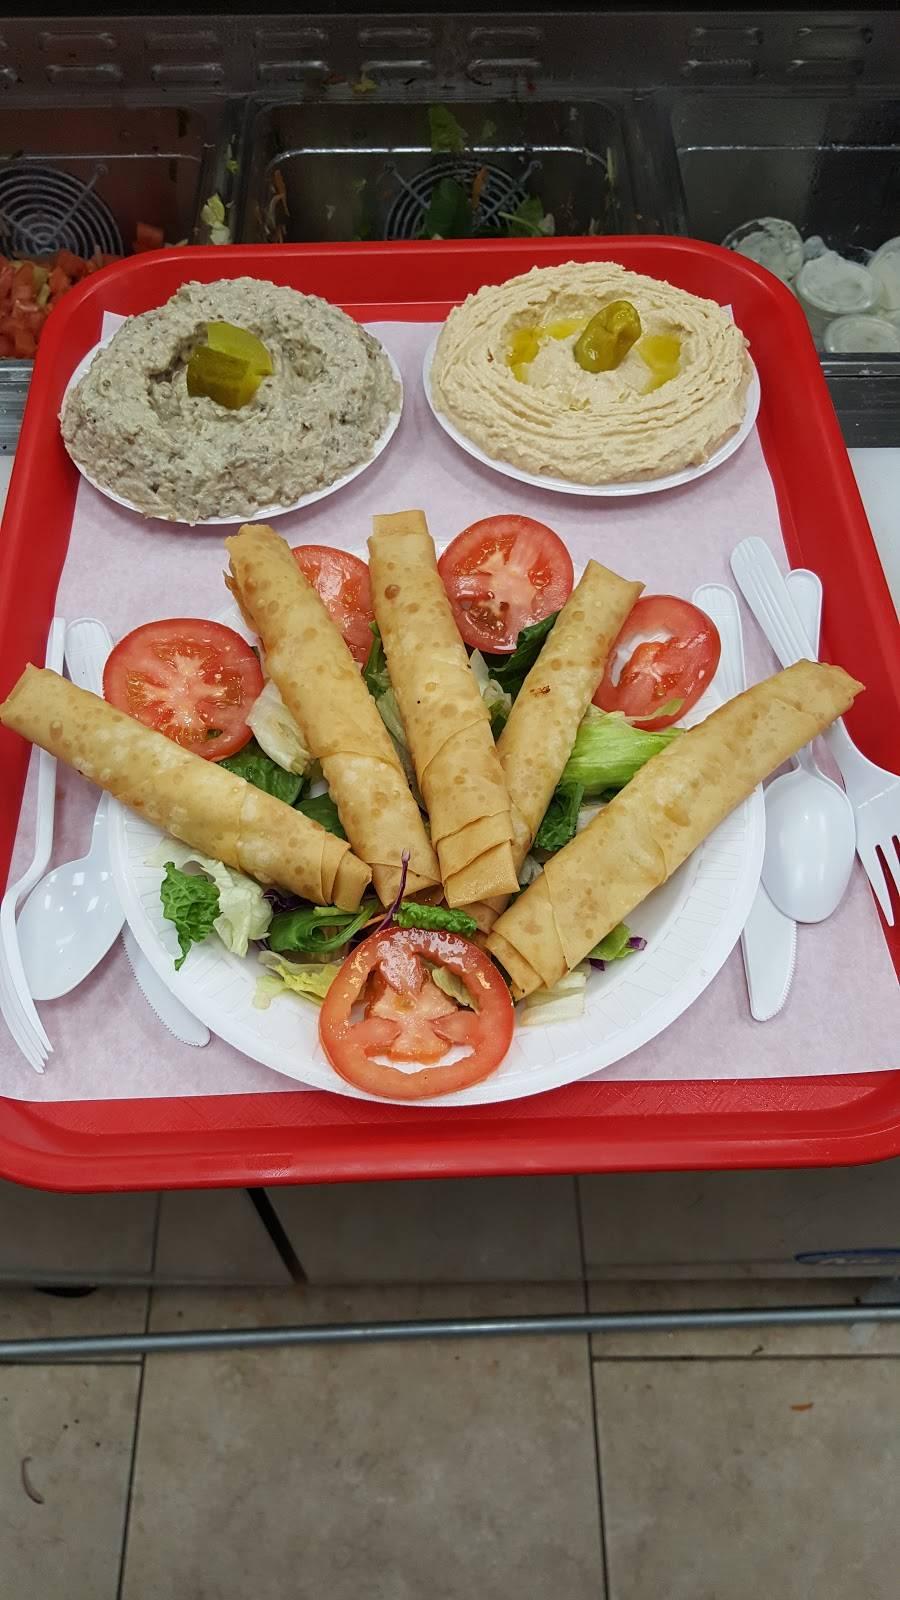 Gallipoli Pita Grill | restaurant | 4611 Sunrise Hwy, Bohemia, NY 11716, USA | 6317506300 OR +1 631-750-6300